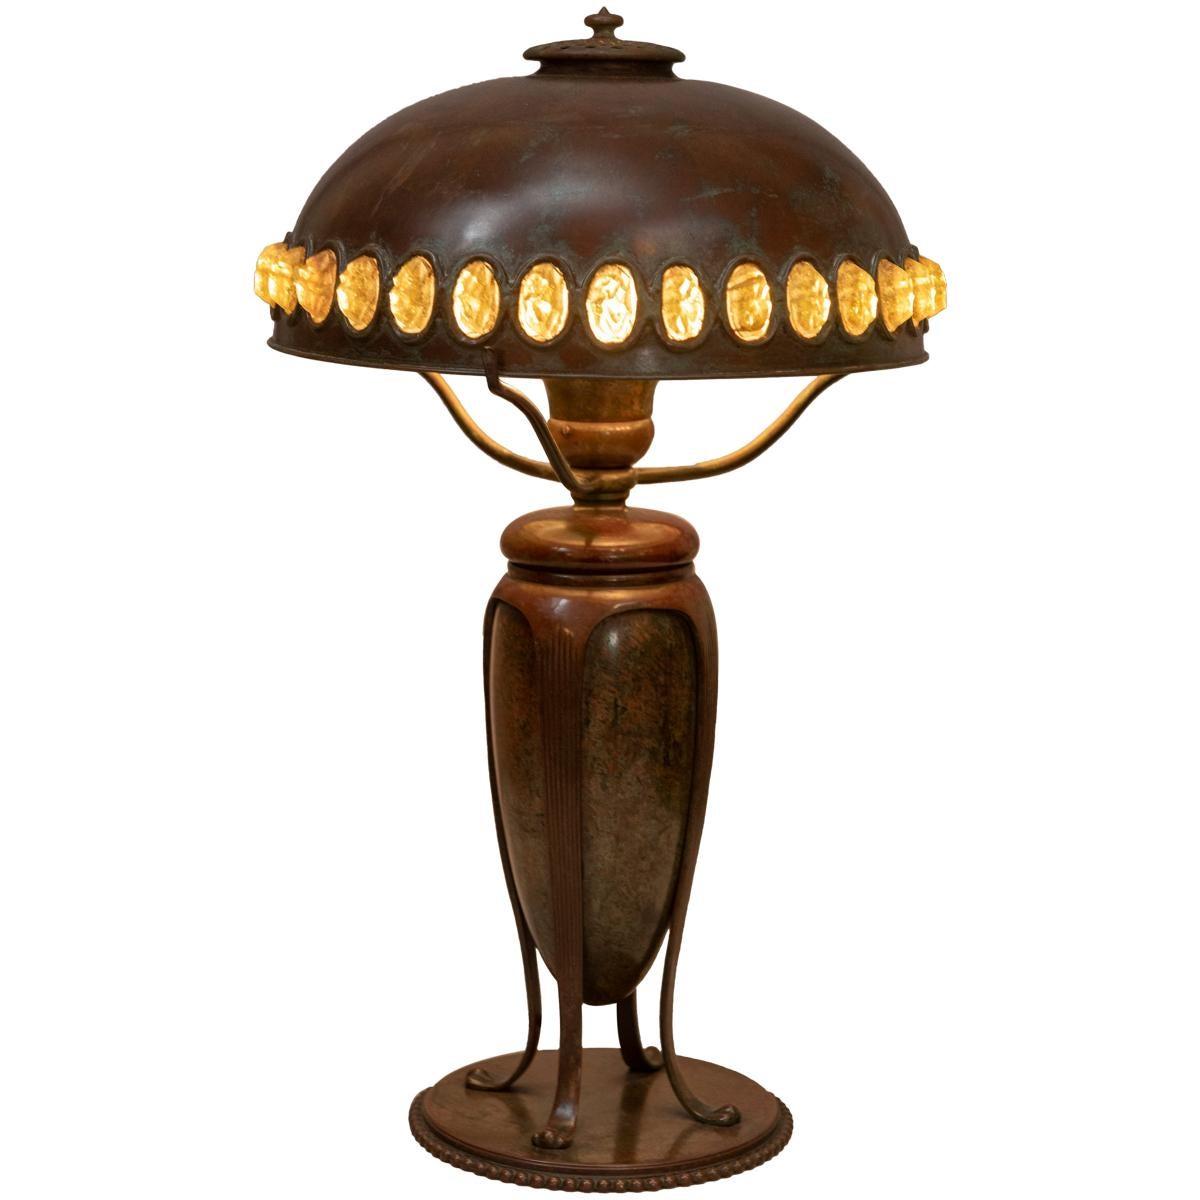 Tiffany Studios Table Lamp with Jeweled Shade, circa 1905